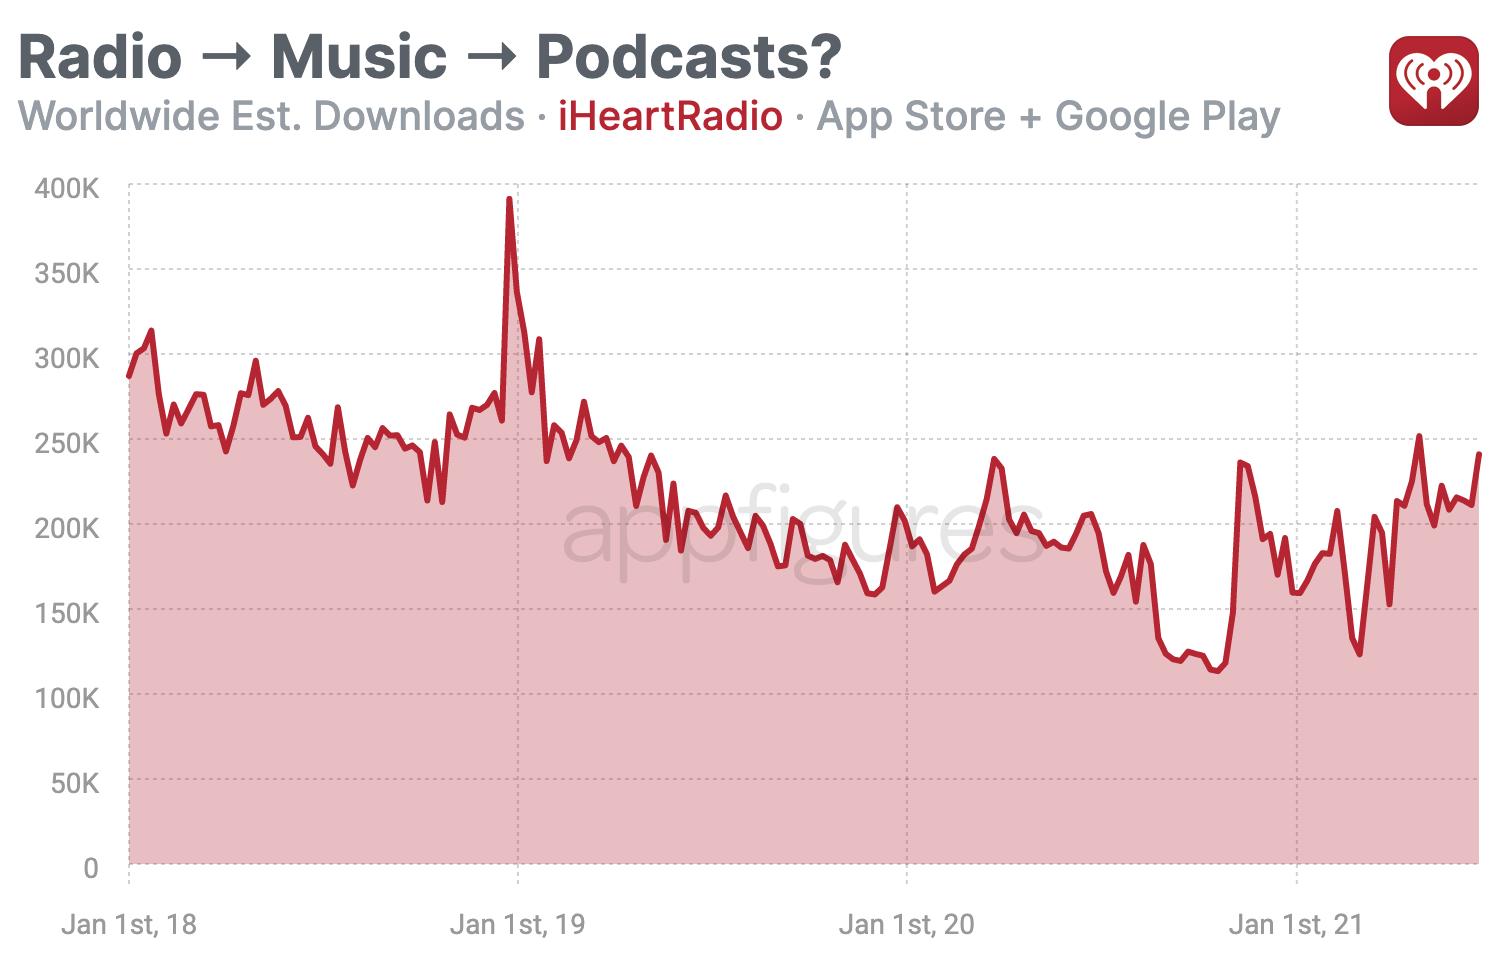 iHeartRadio estimated downloads